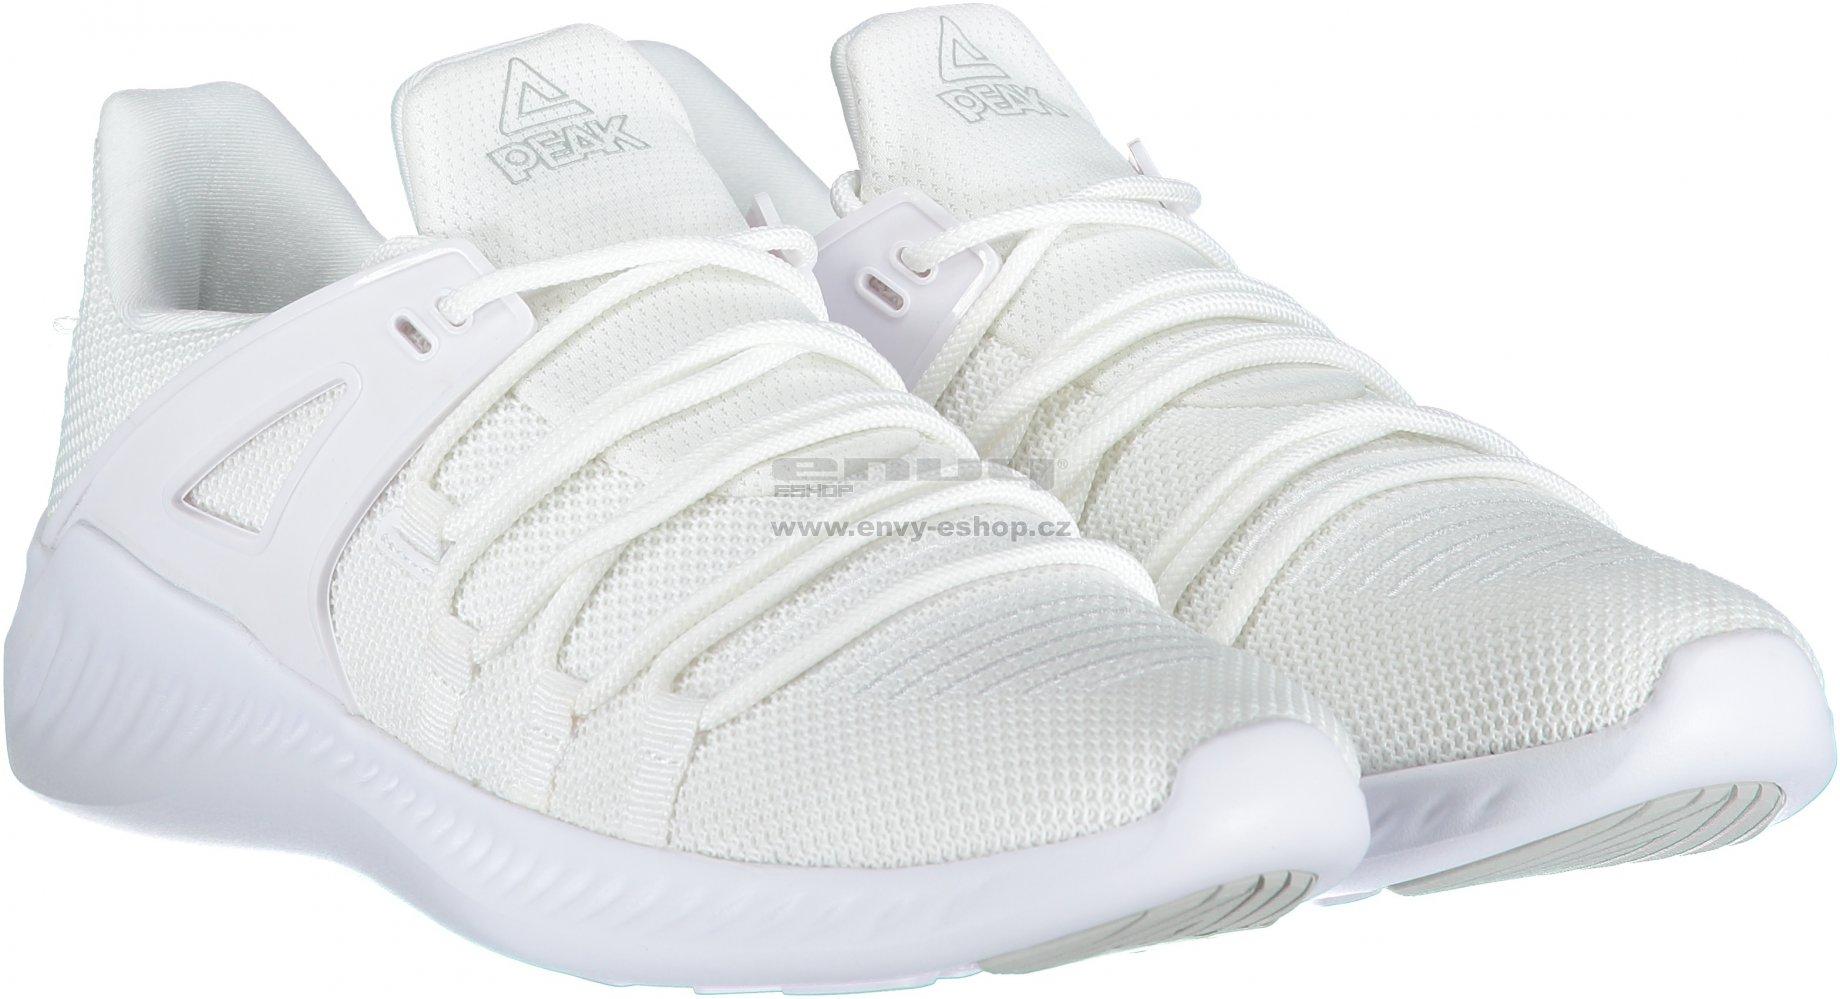 ec842ae4a9b Dámské sportovní boty PEAK URBAN CASUAL SHOES EW83138E BÍLÁ velikost ...